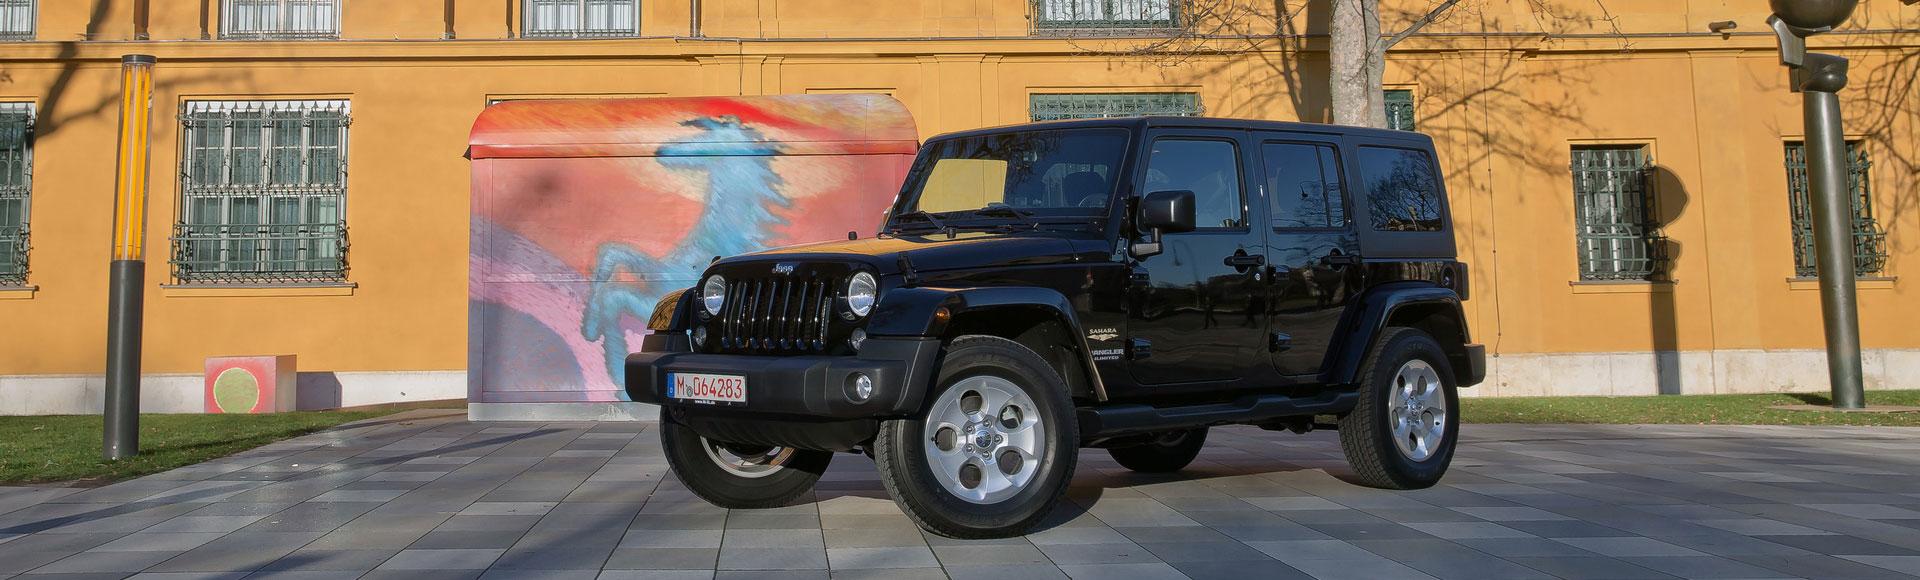 Jeep Wrangler 2015 Herbst 0067